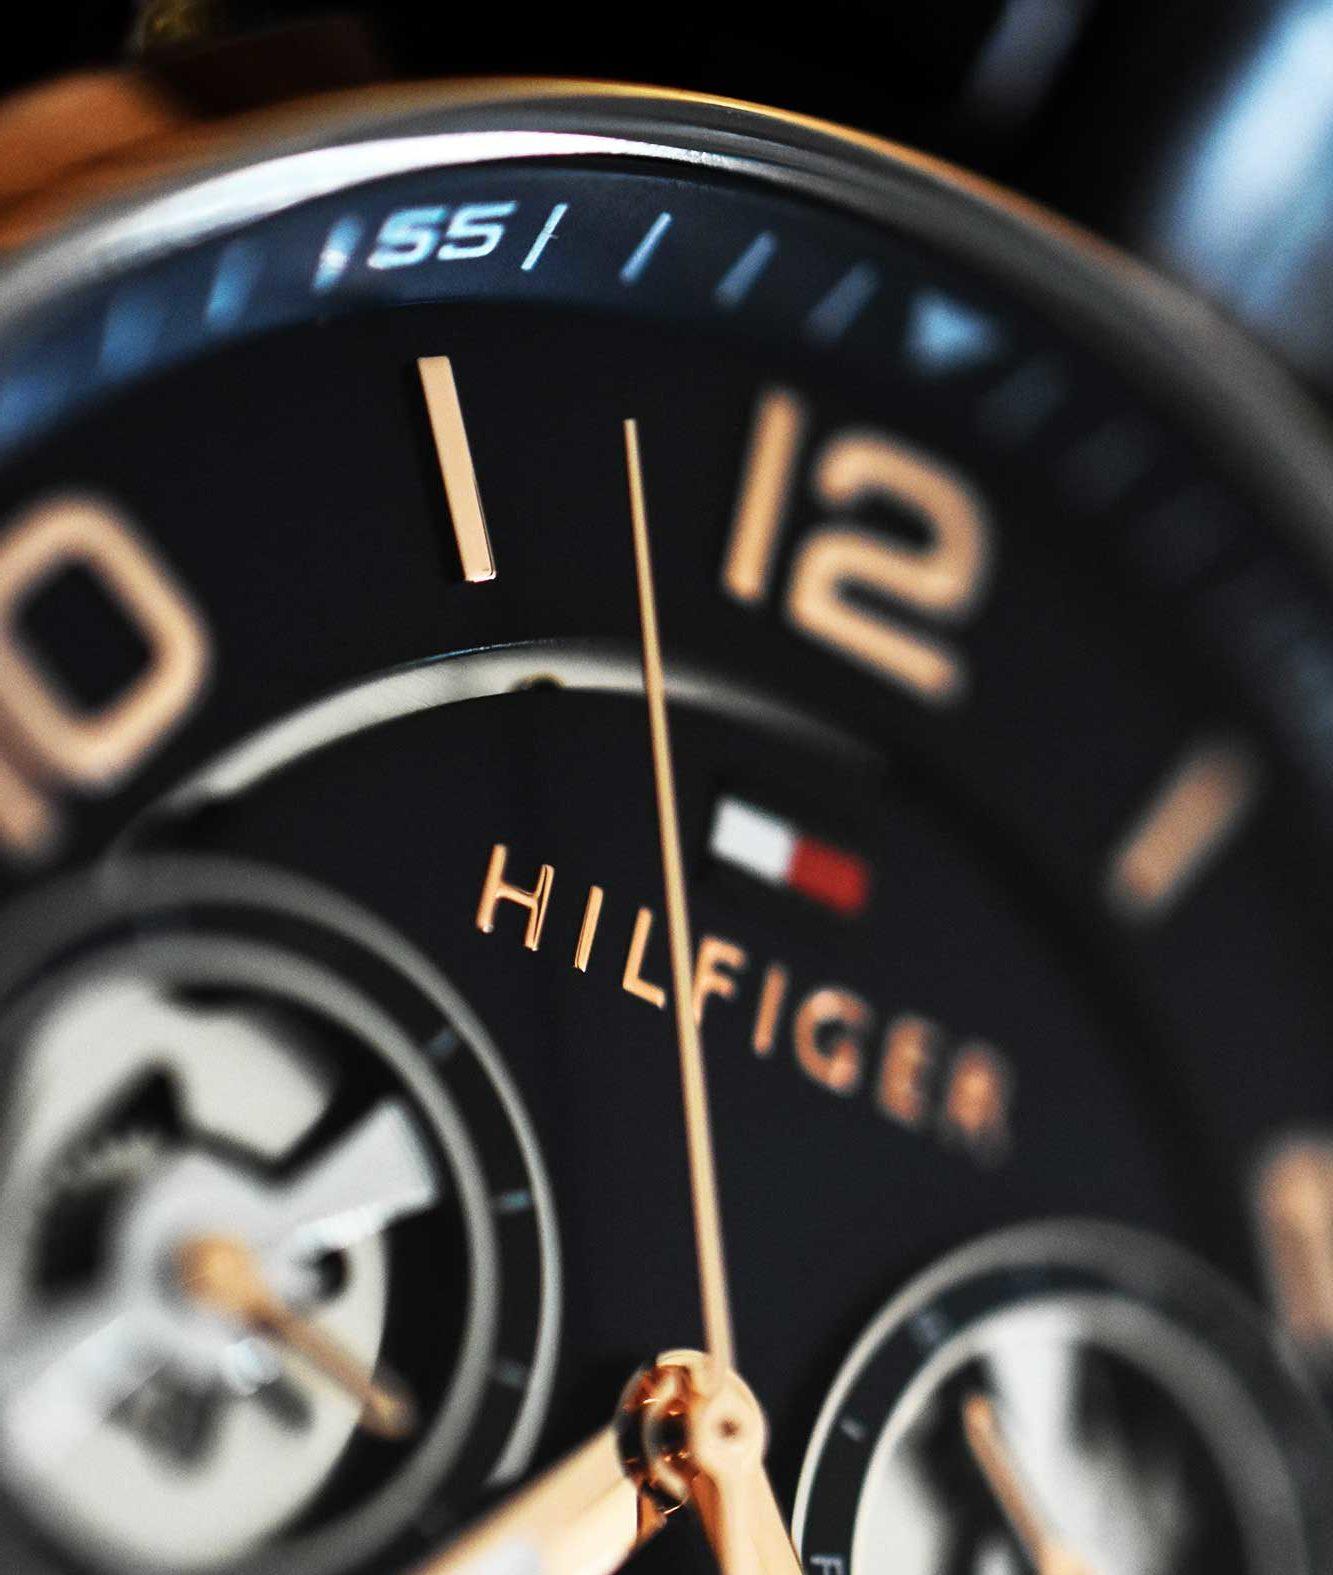 tommy-hilfiger-watch-wholesale-e1594085604493